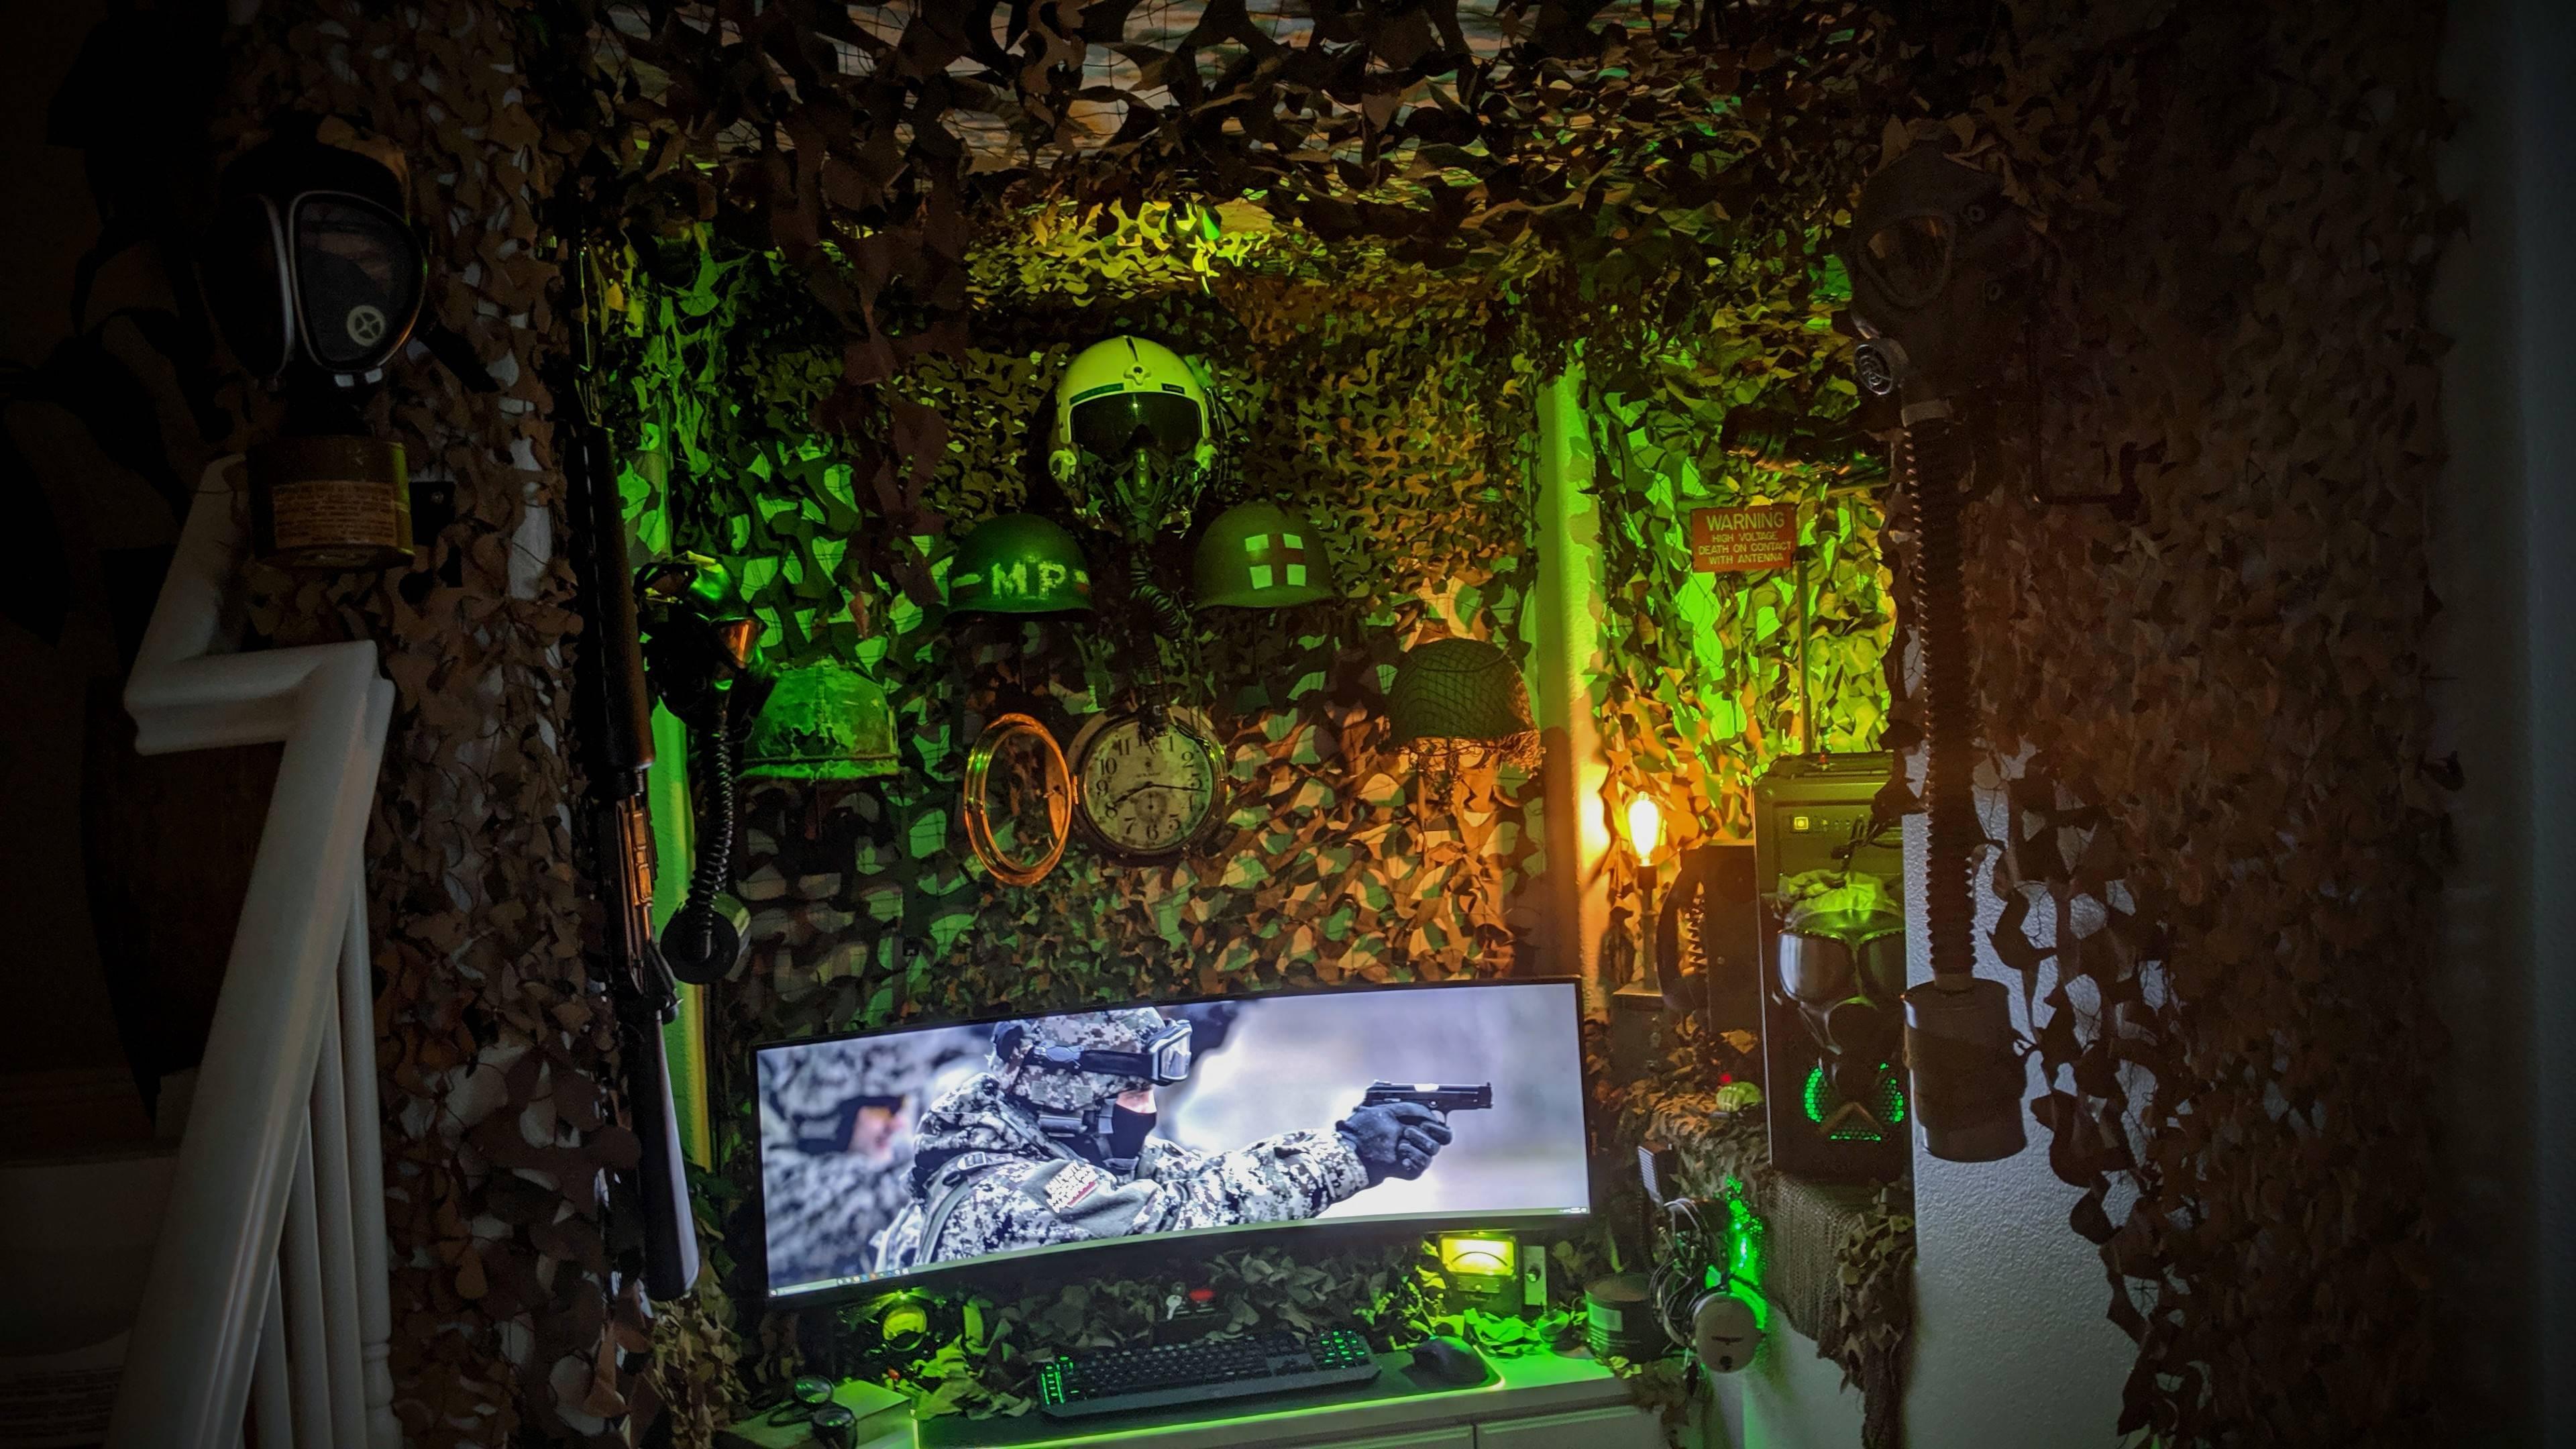 edgaroganesyan's Setup - Cartier's Insane Military inspired Bunker Setup | Scooget